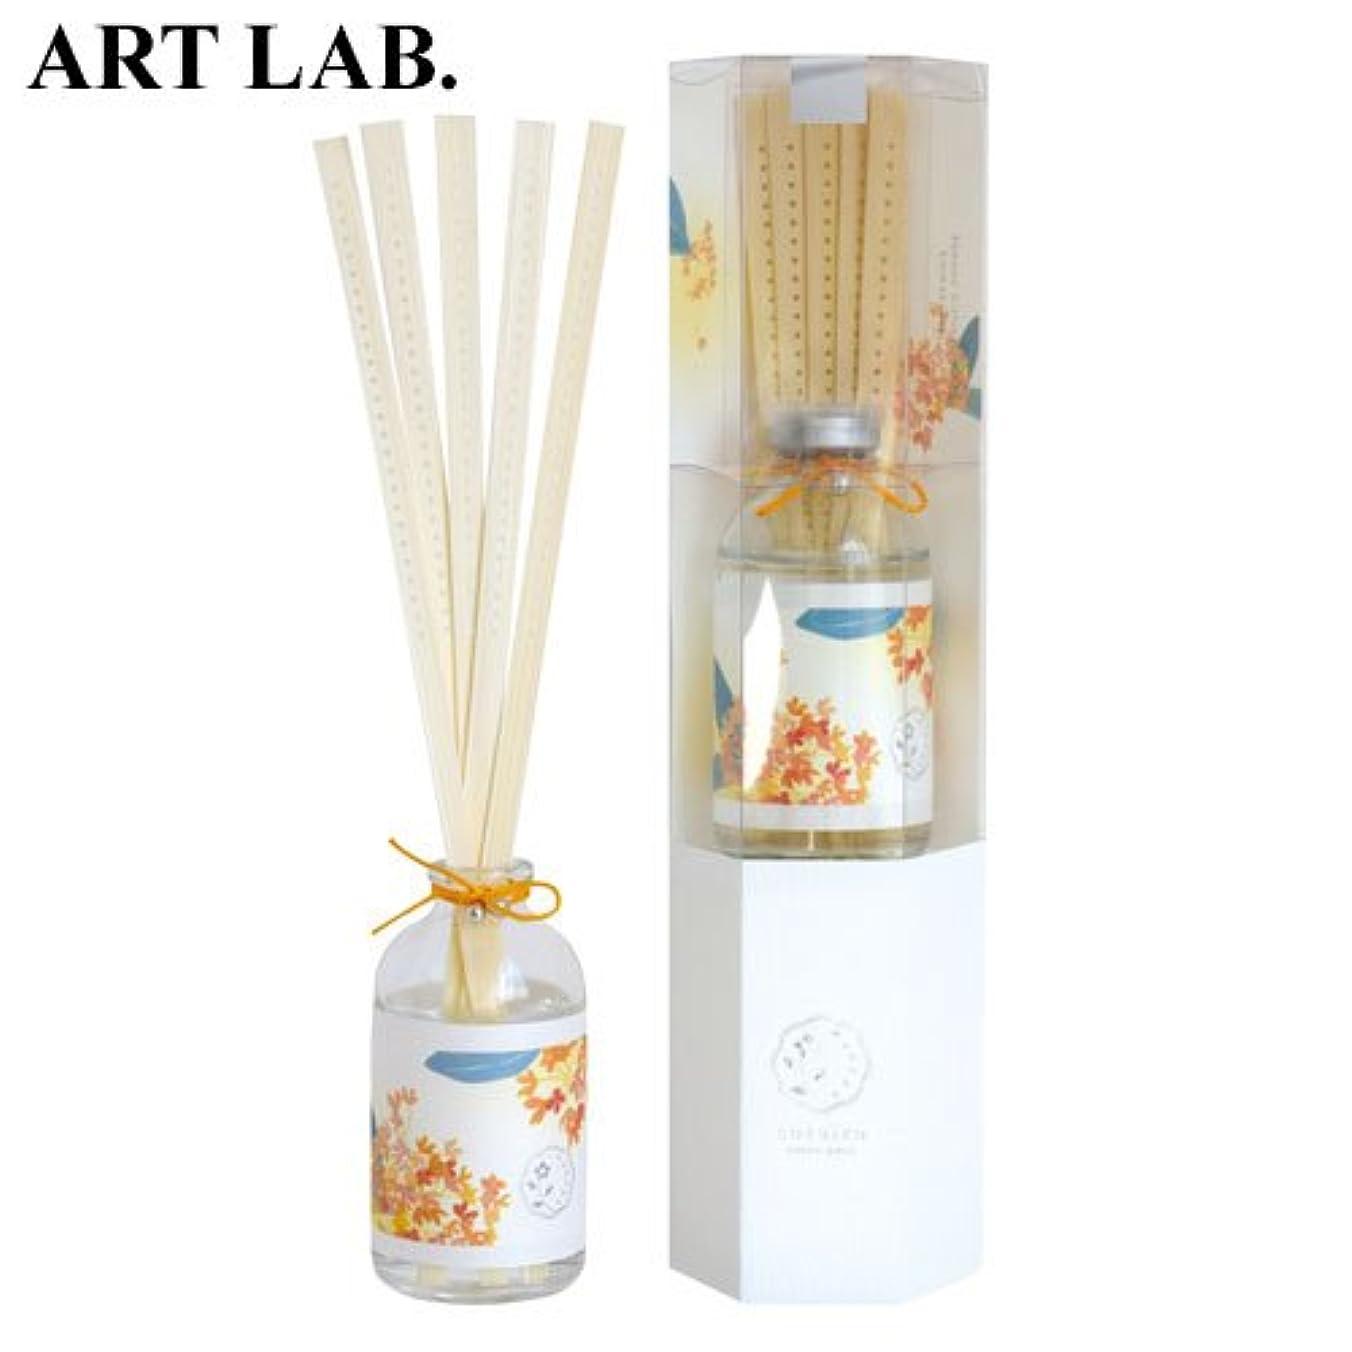 wanokaバンブーディフューザー金木犀《果実のような甘い香り》ART LABAroma Diffuser